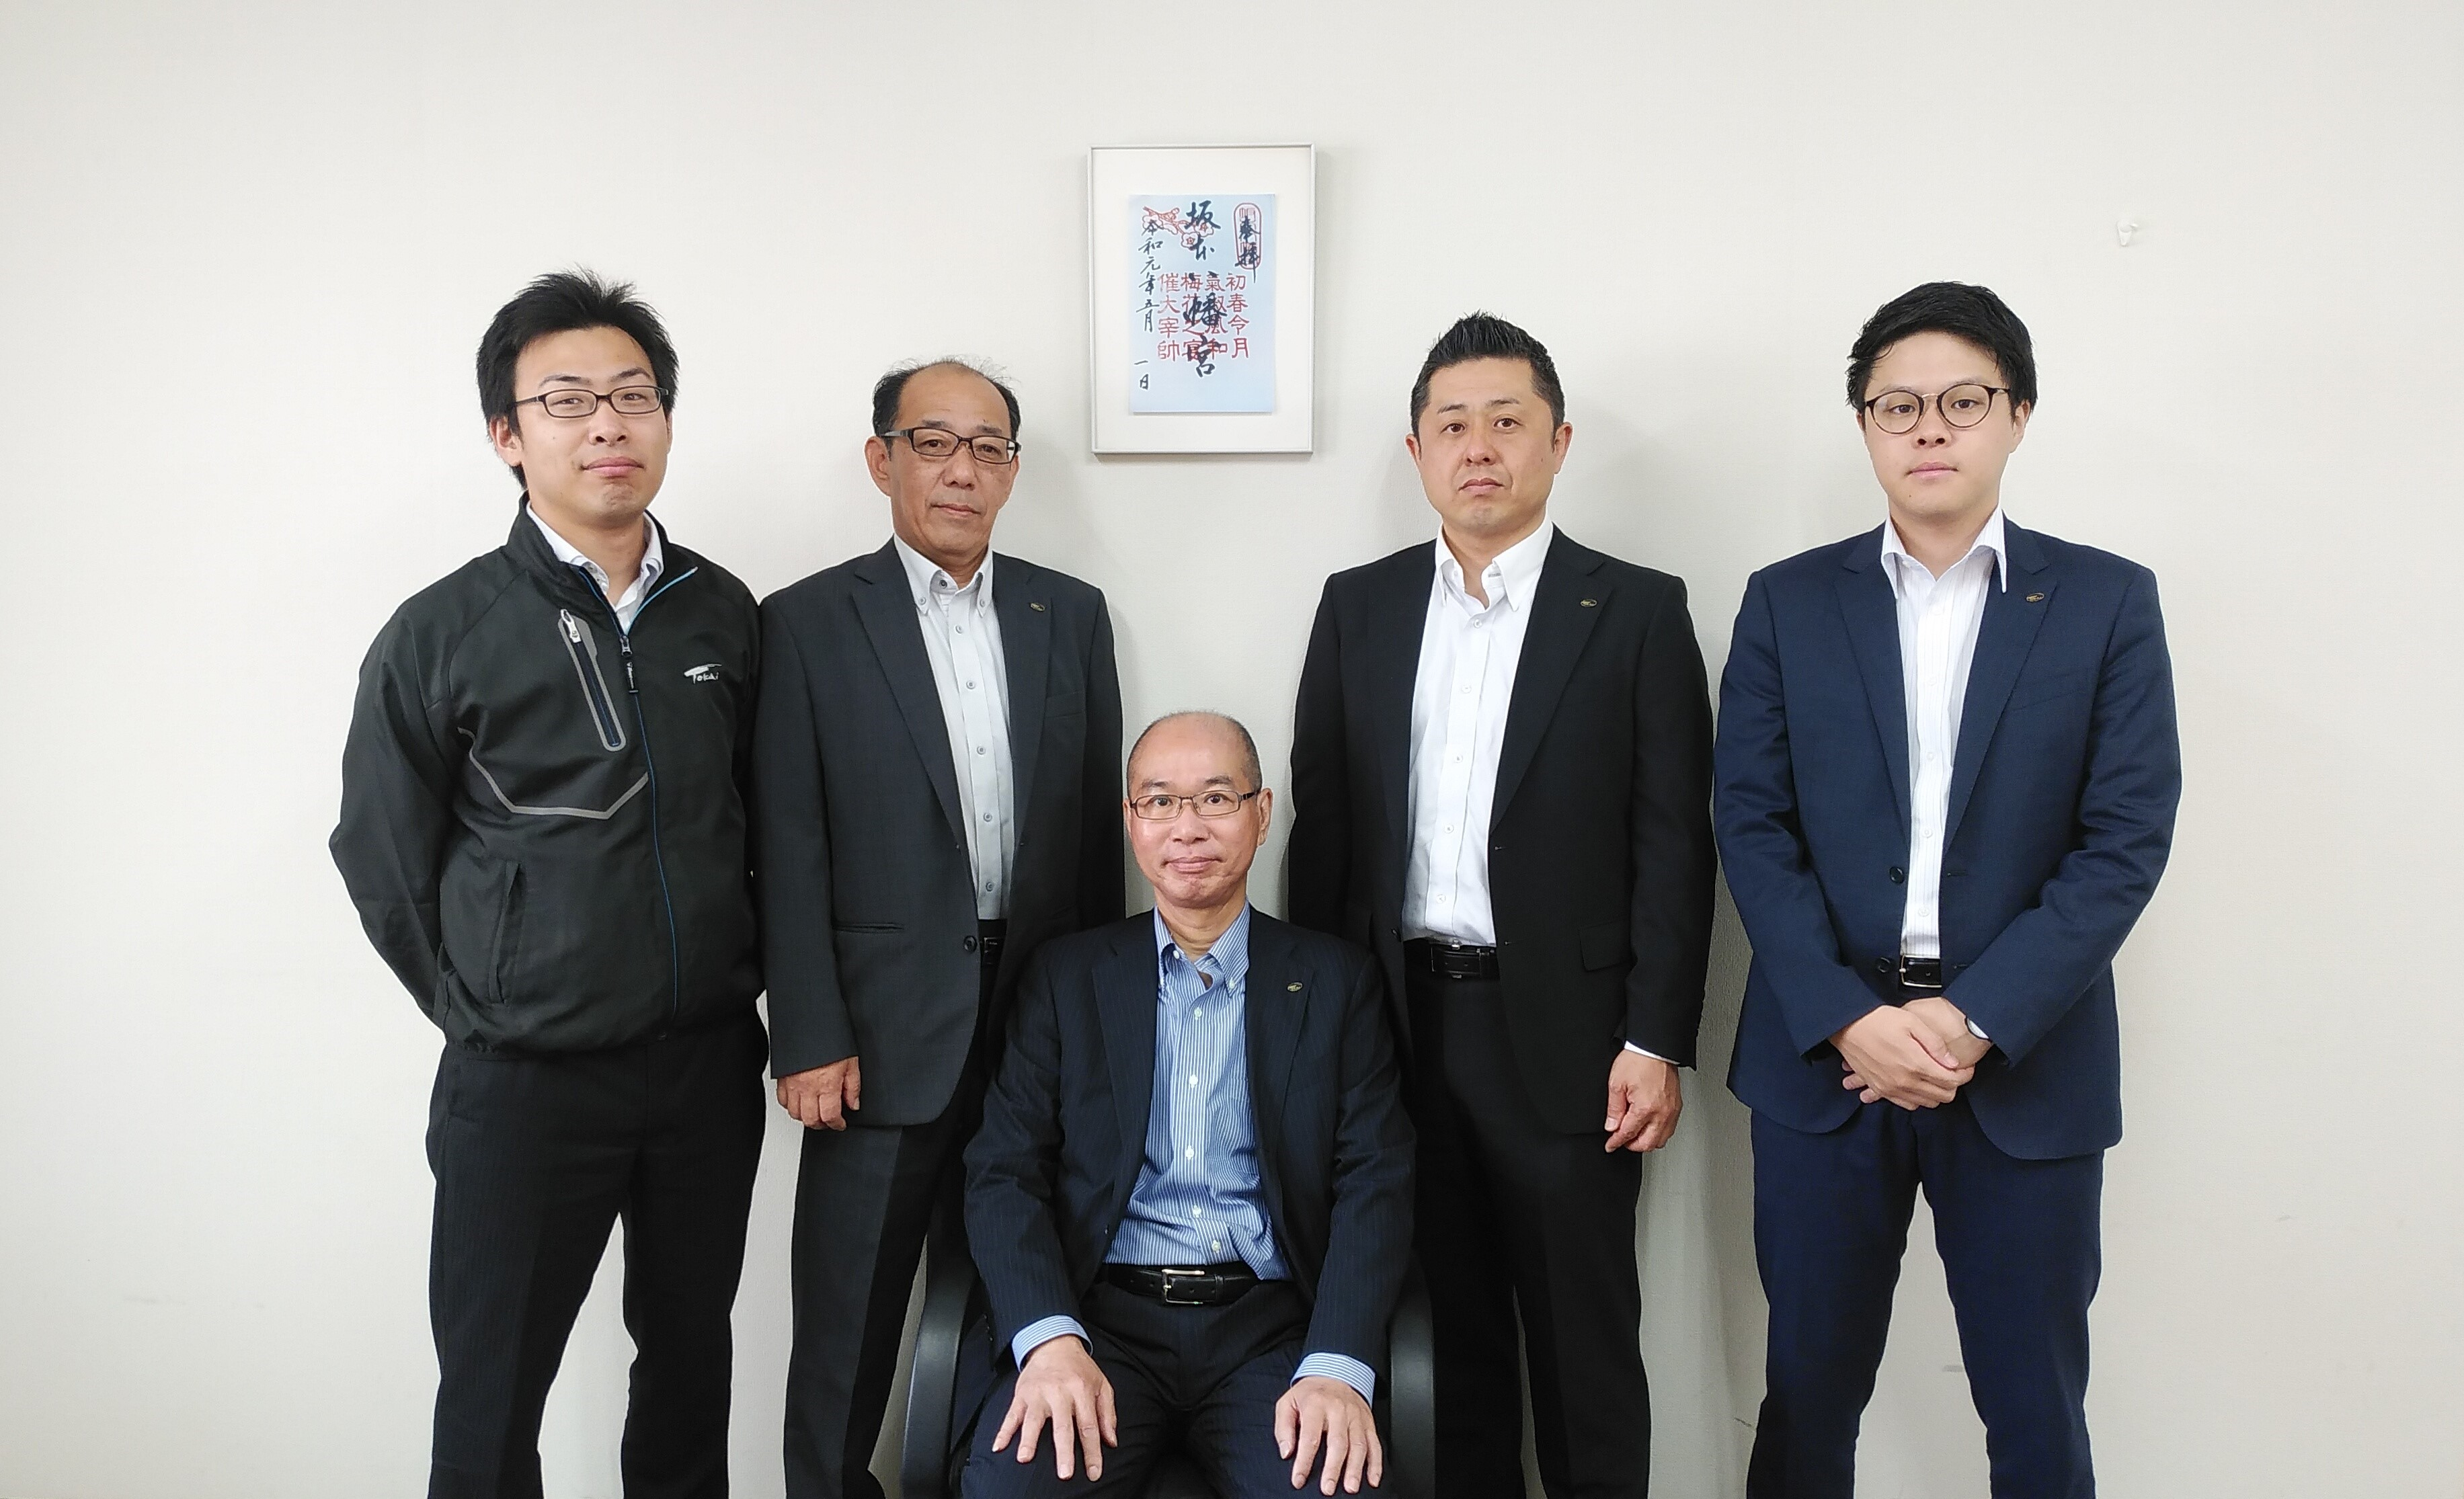 https://tokaikosho.com/kanri/wp-content/uploads/2019/06/HPfukuoka-1.jpg